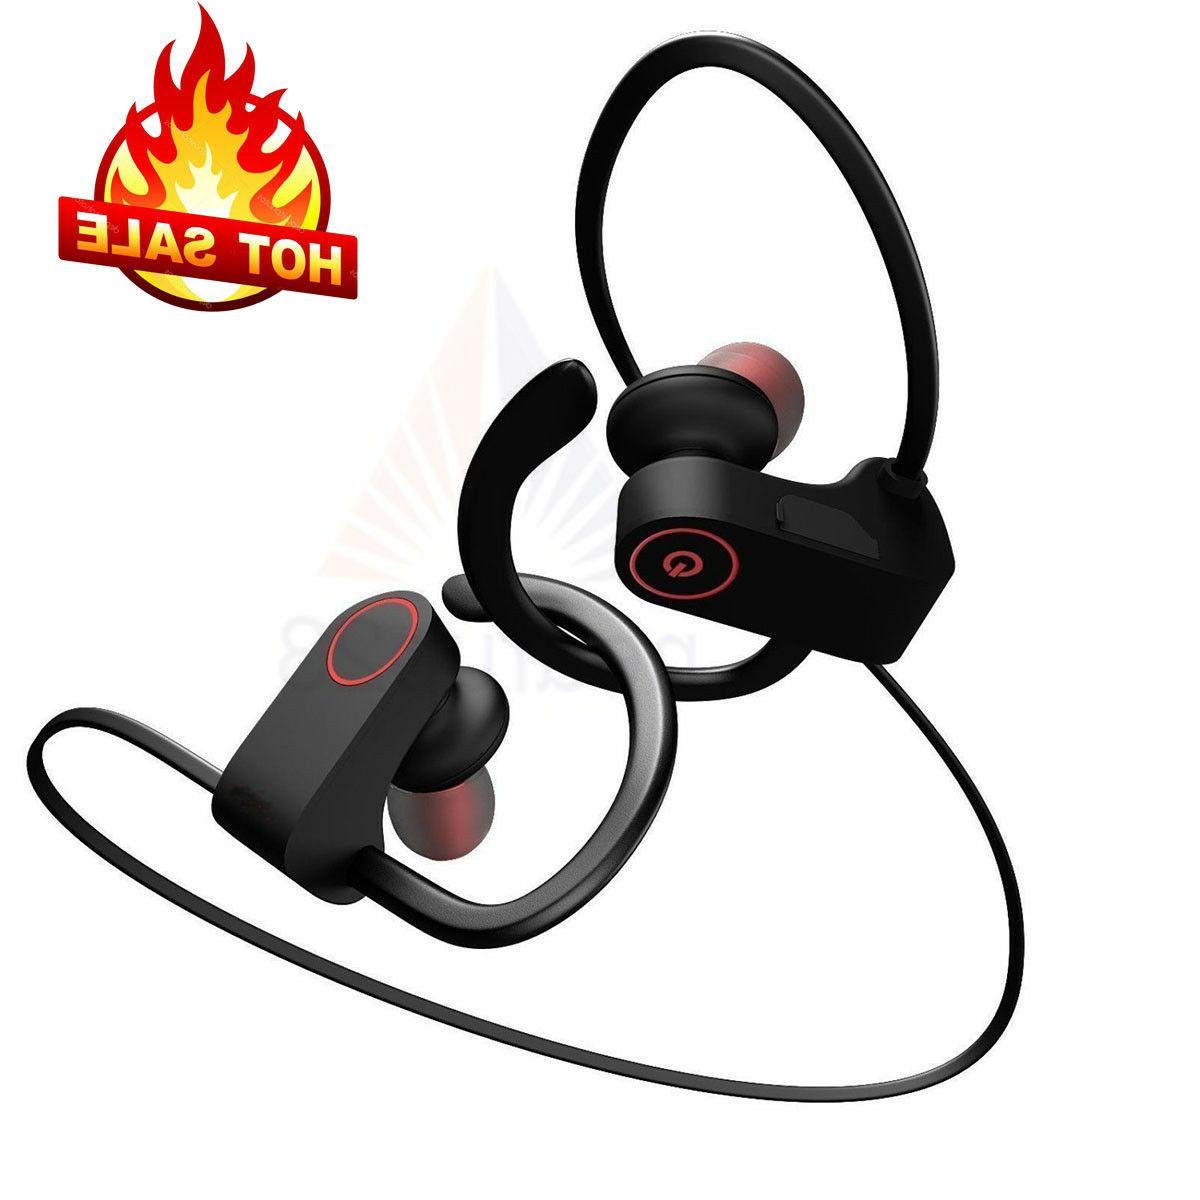 invictus Bluetooth Headphones Best Running Sports Wireless Earbuds